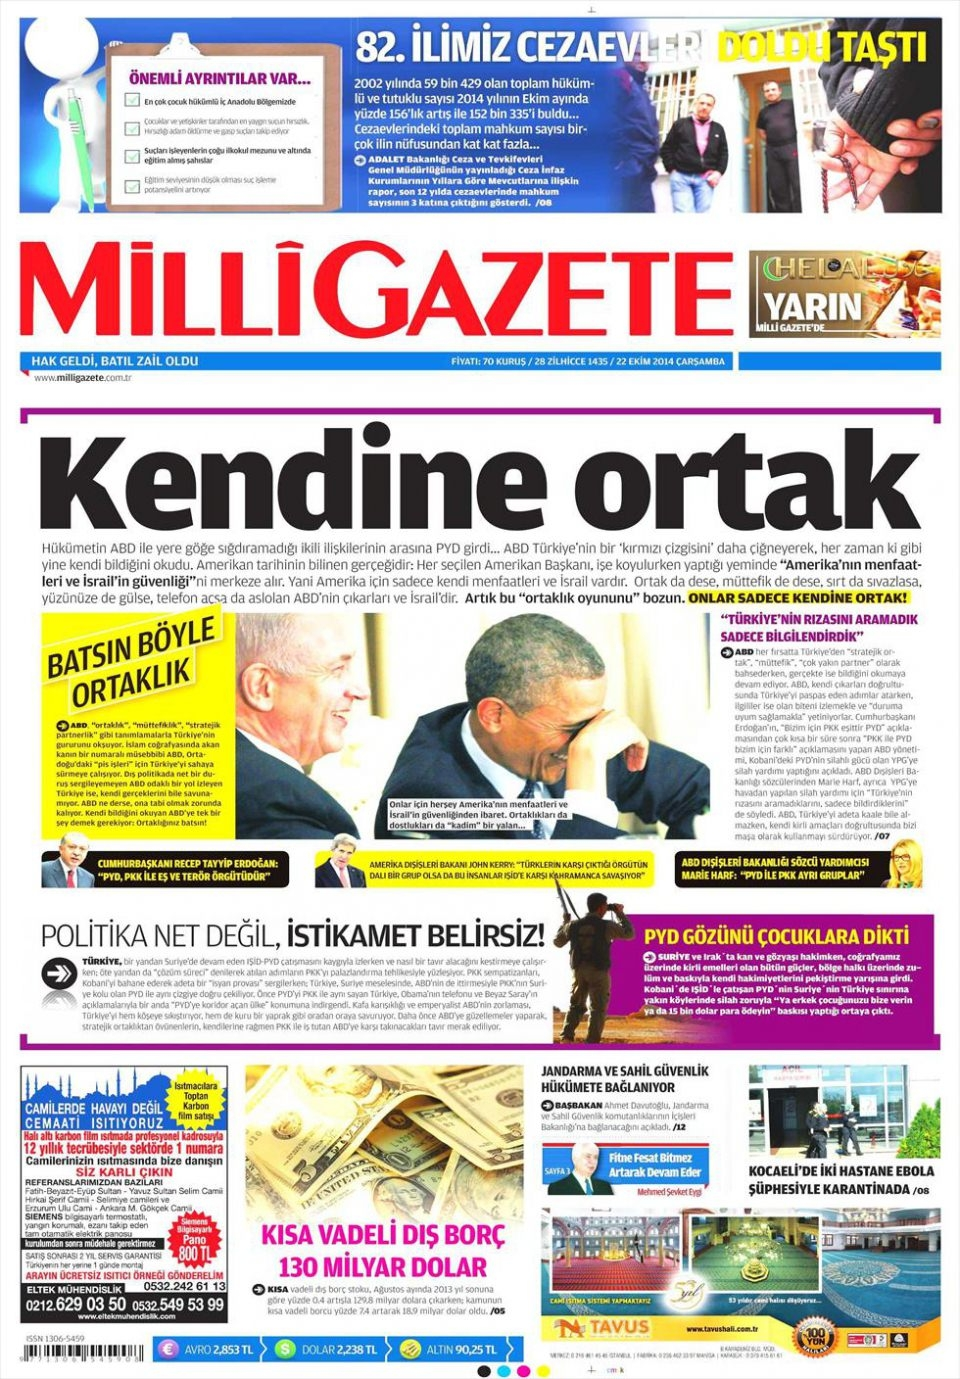 22 Ekim 2014 gazete manşetleri 11